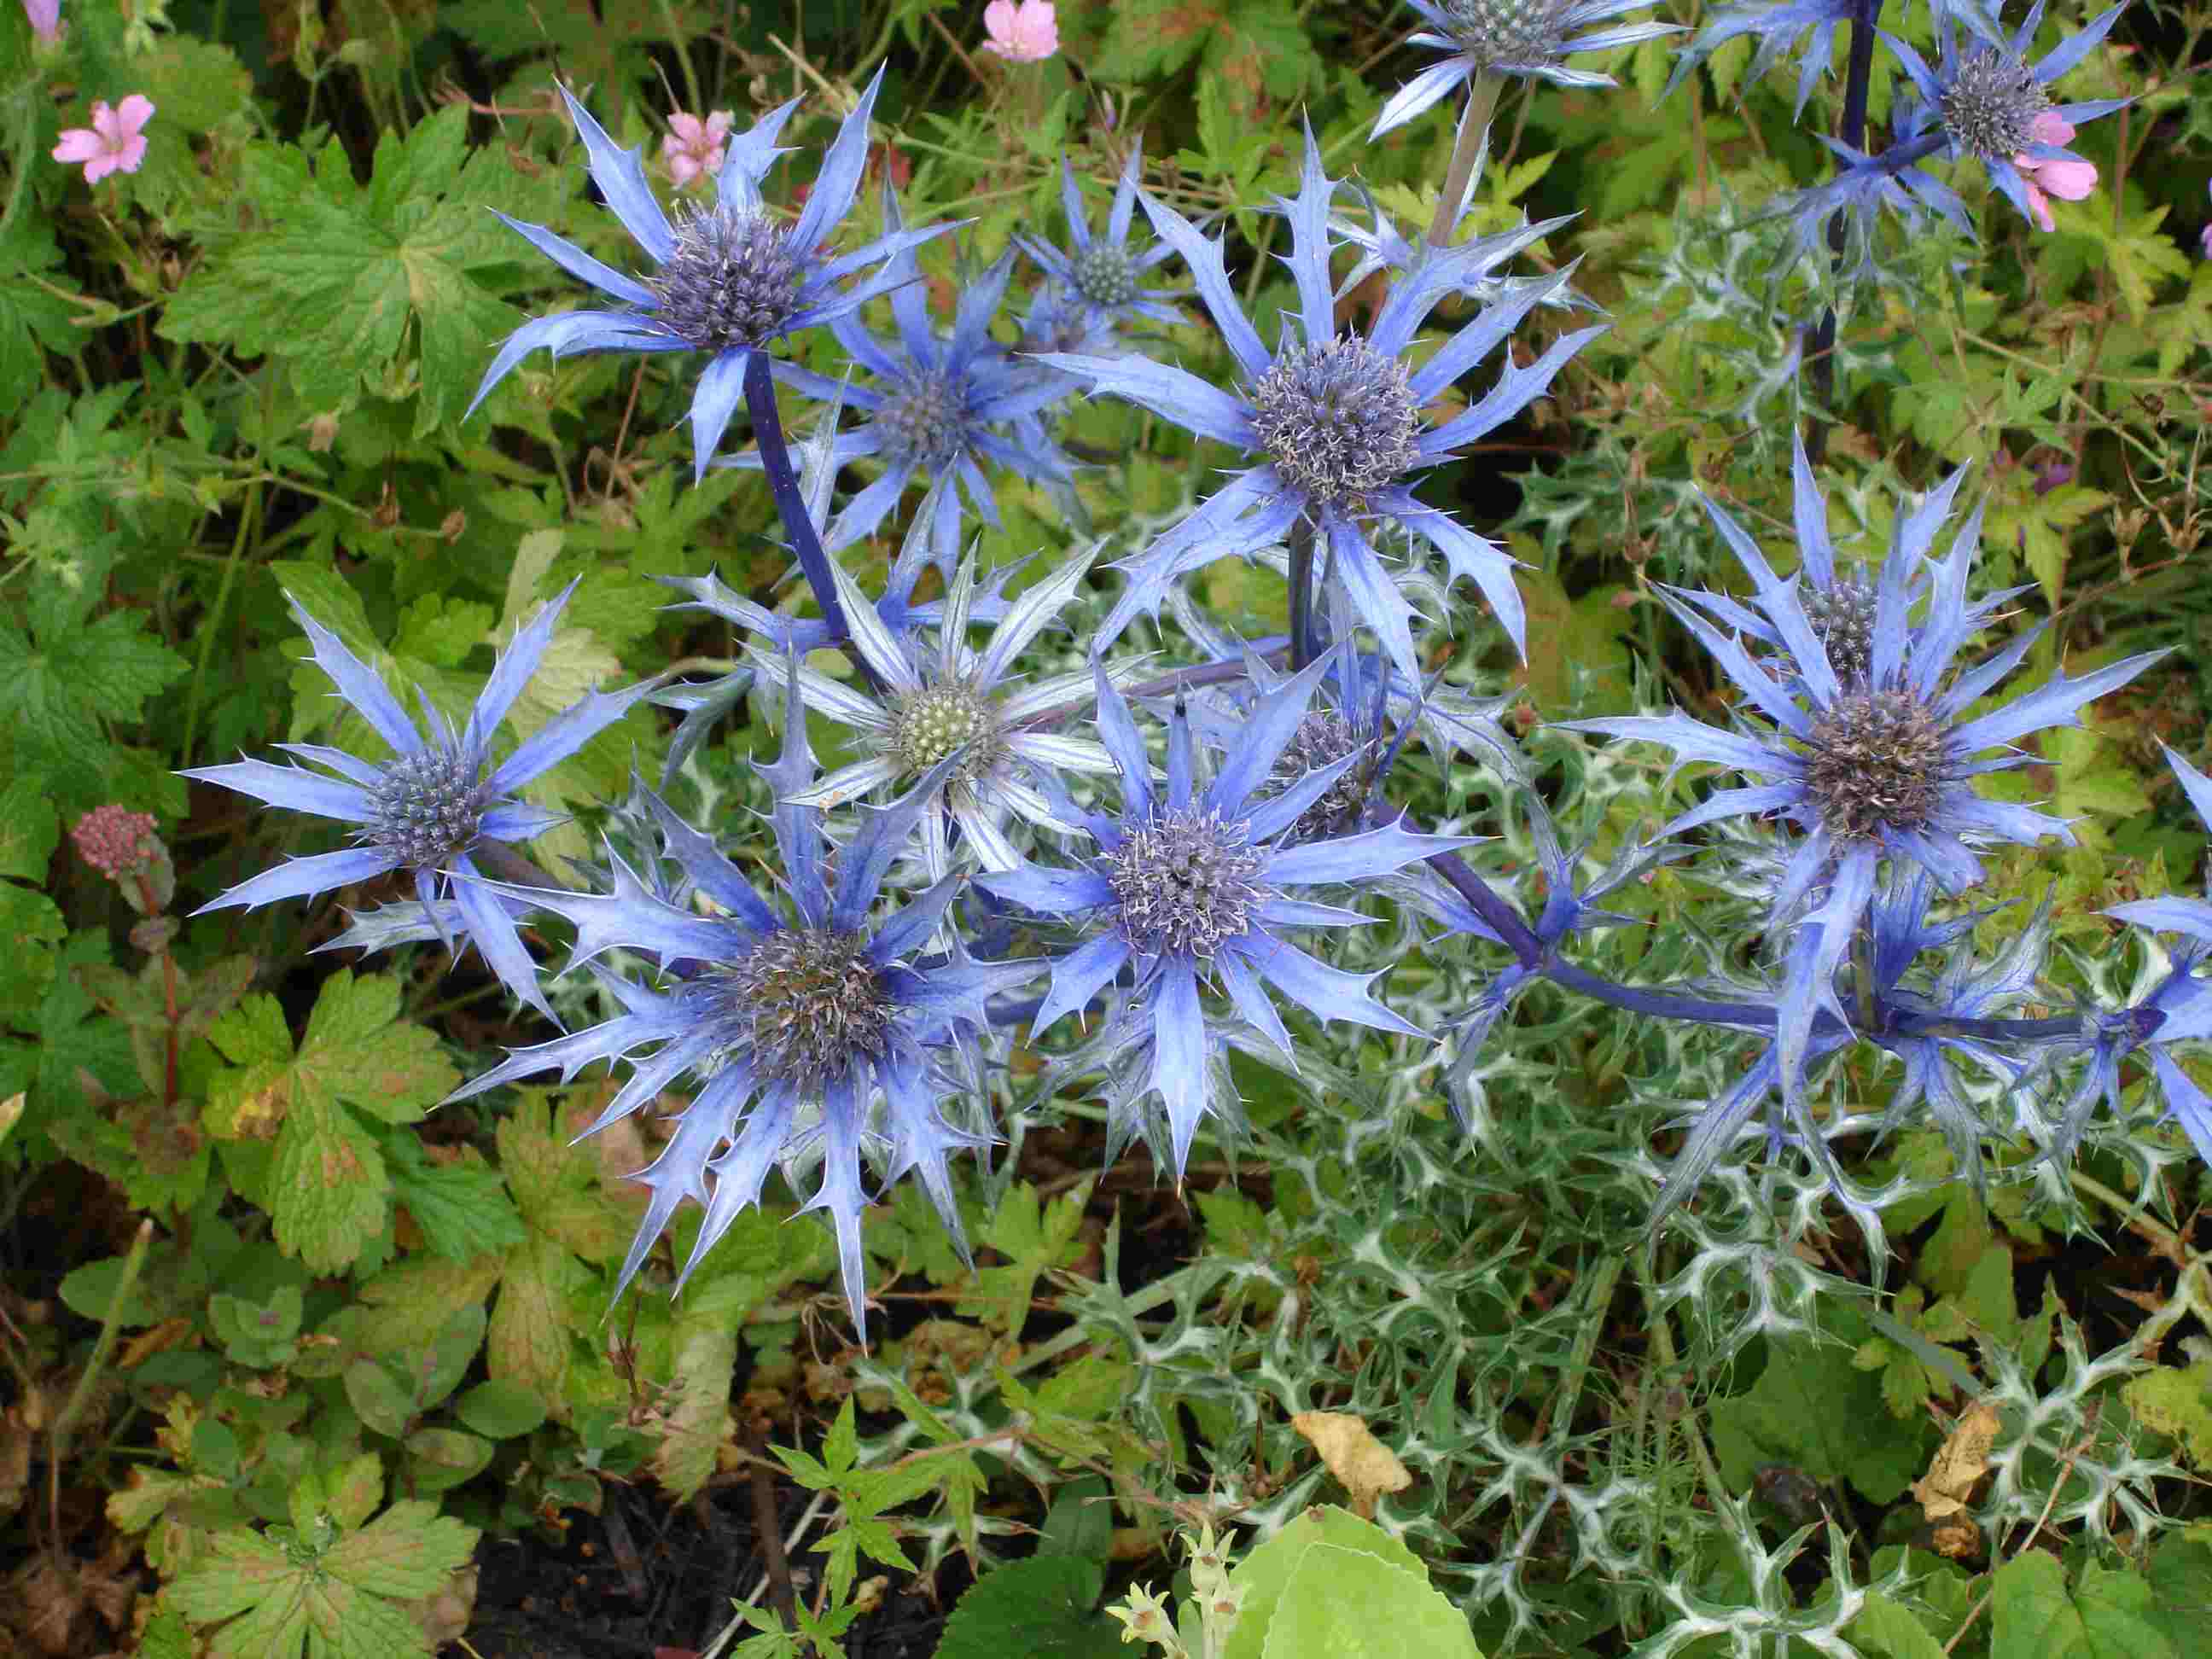 List of hardy perennials bourgatii graham stuart thomas selection mightylinksfo